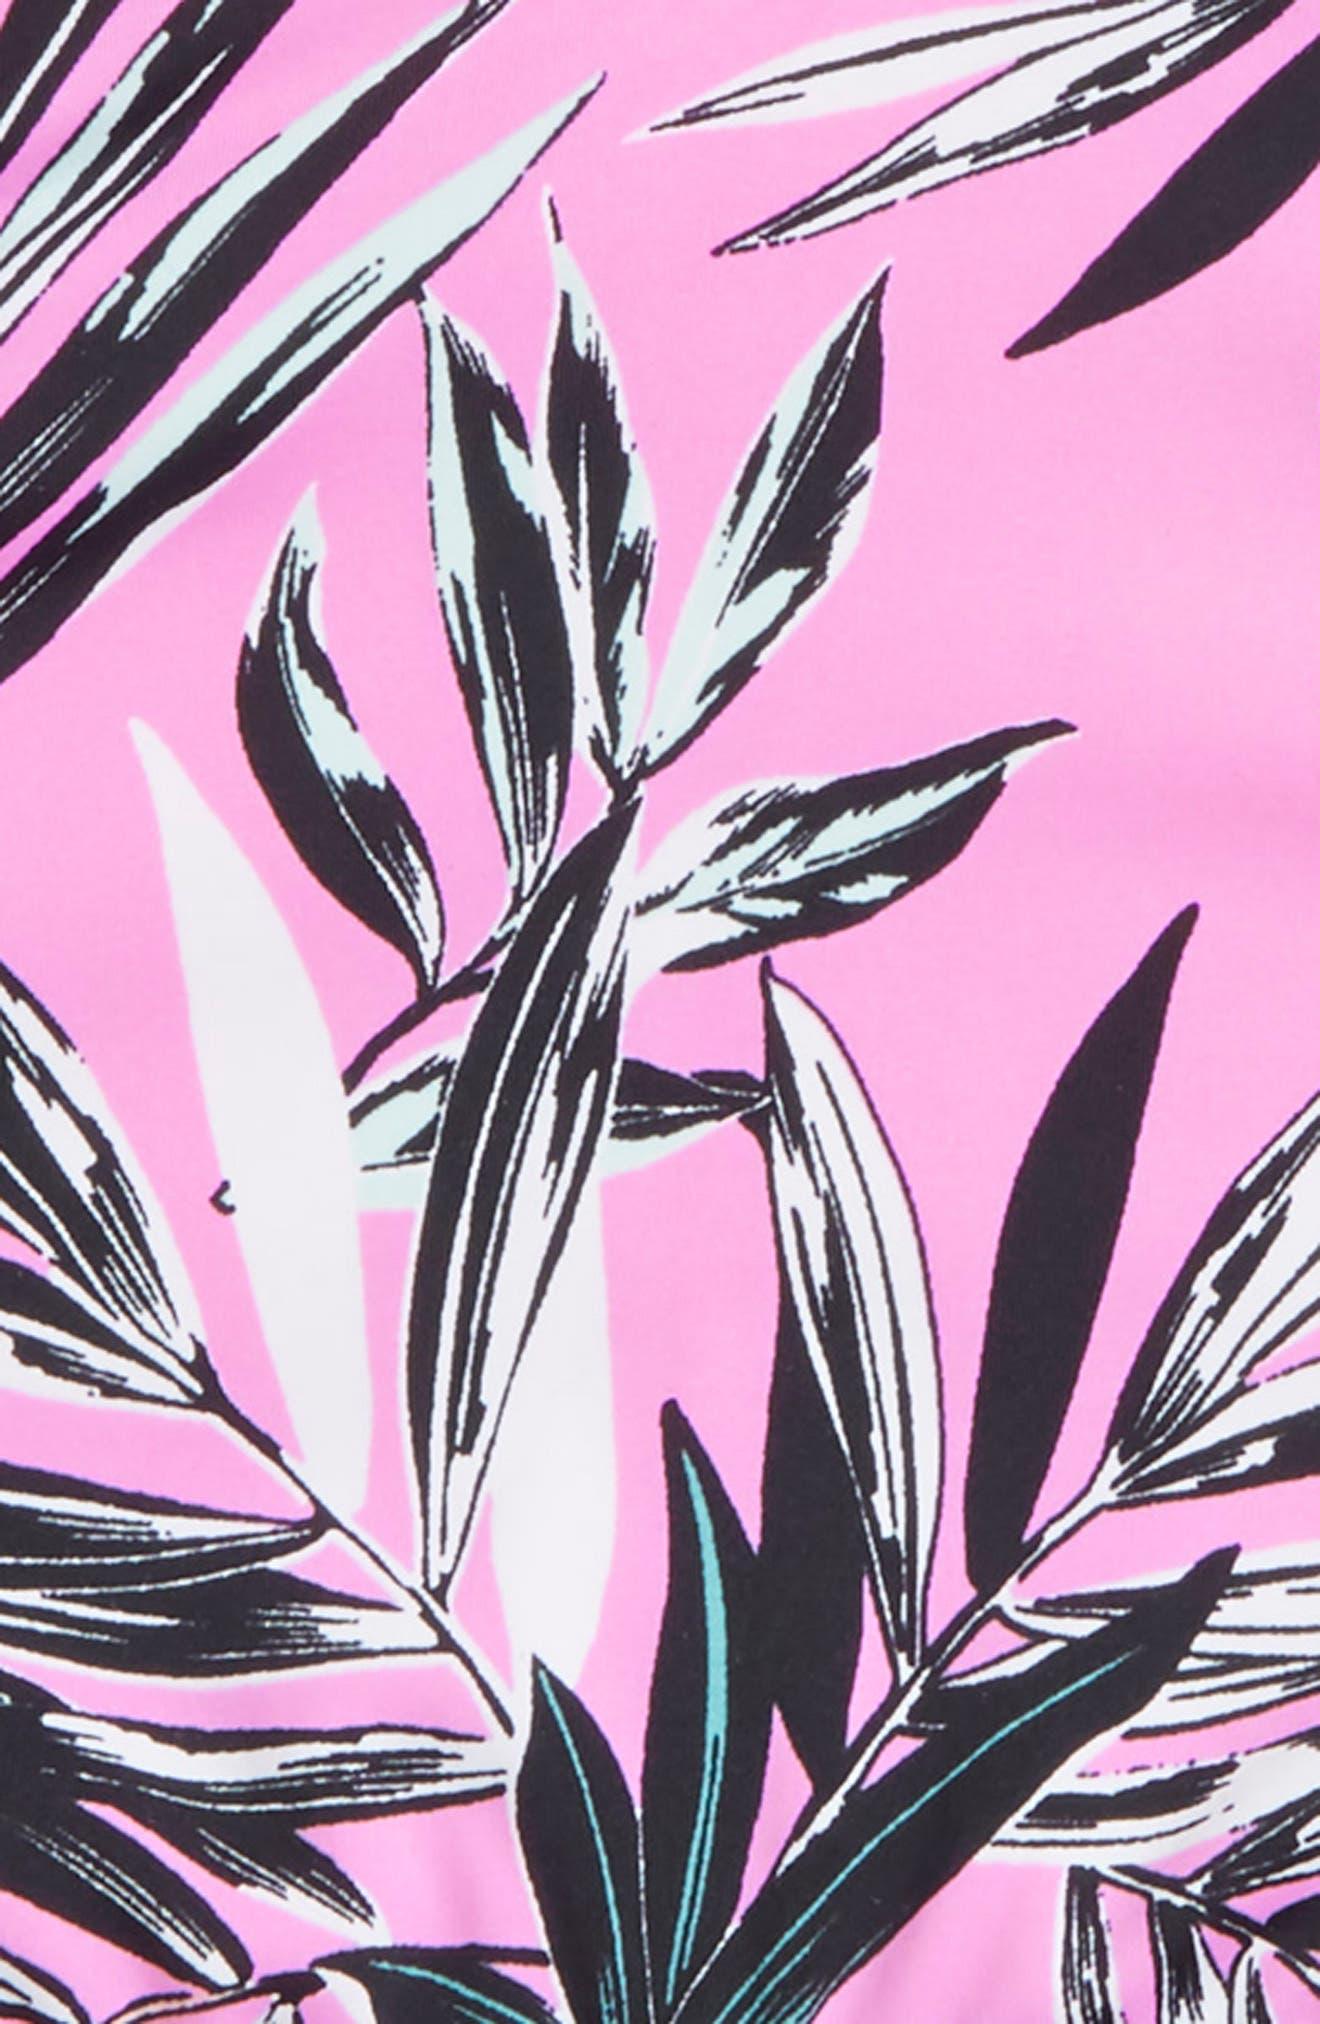 Shara Ruffle Two-Piece Swimsuit,                             Alternate thumbnail 2, color,                             Fuchsia